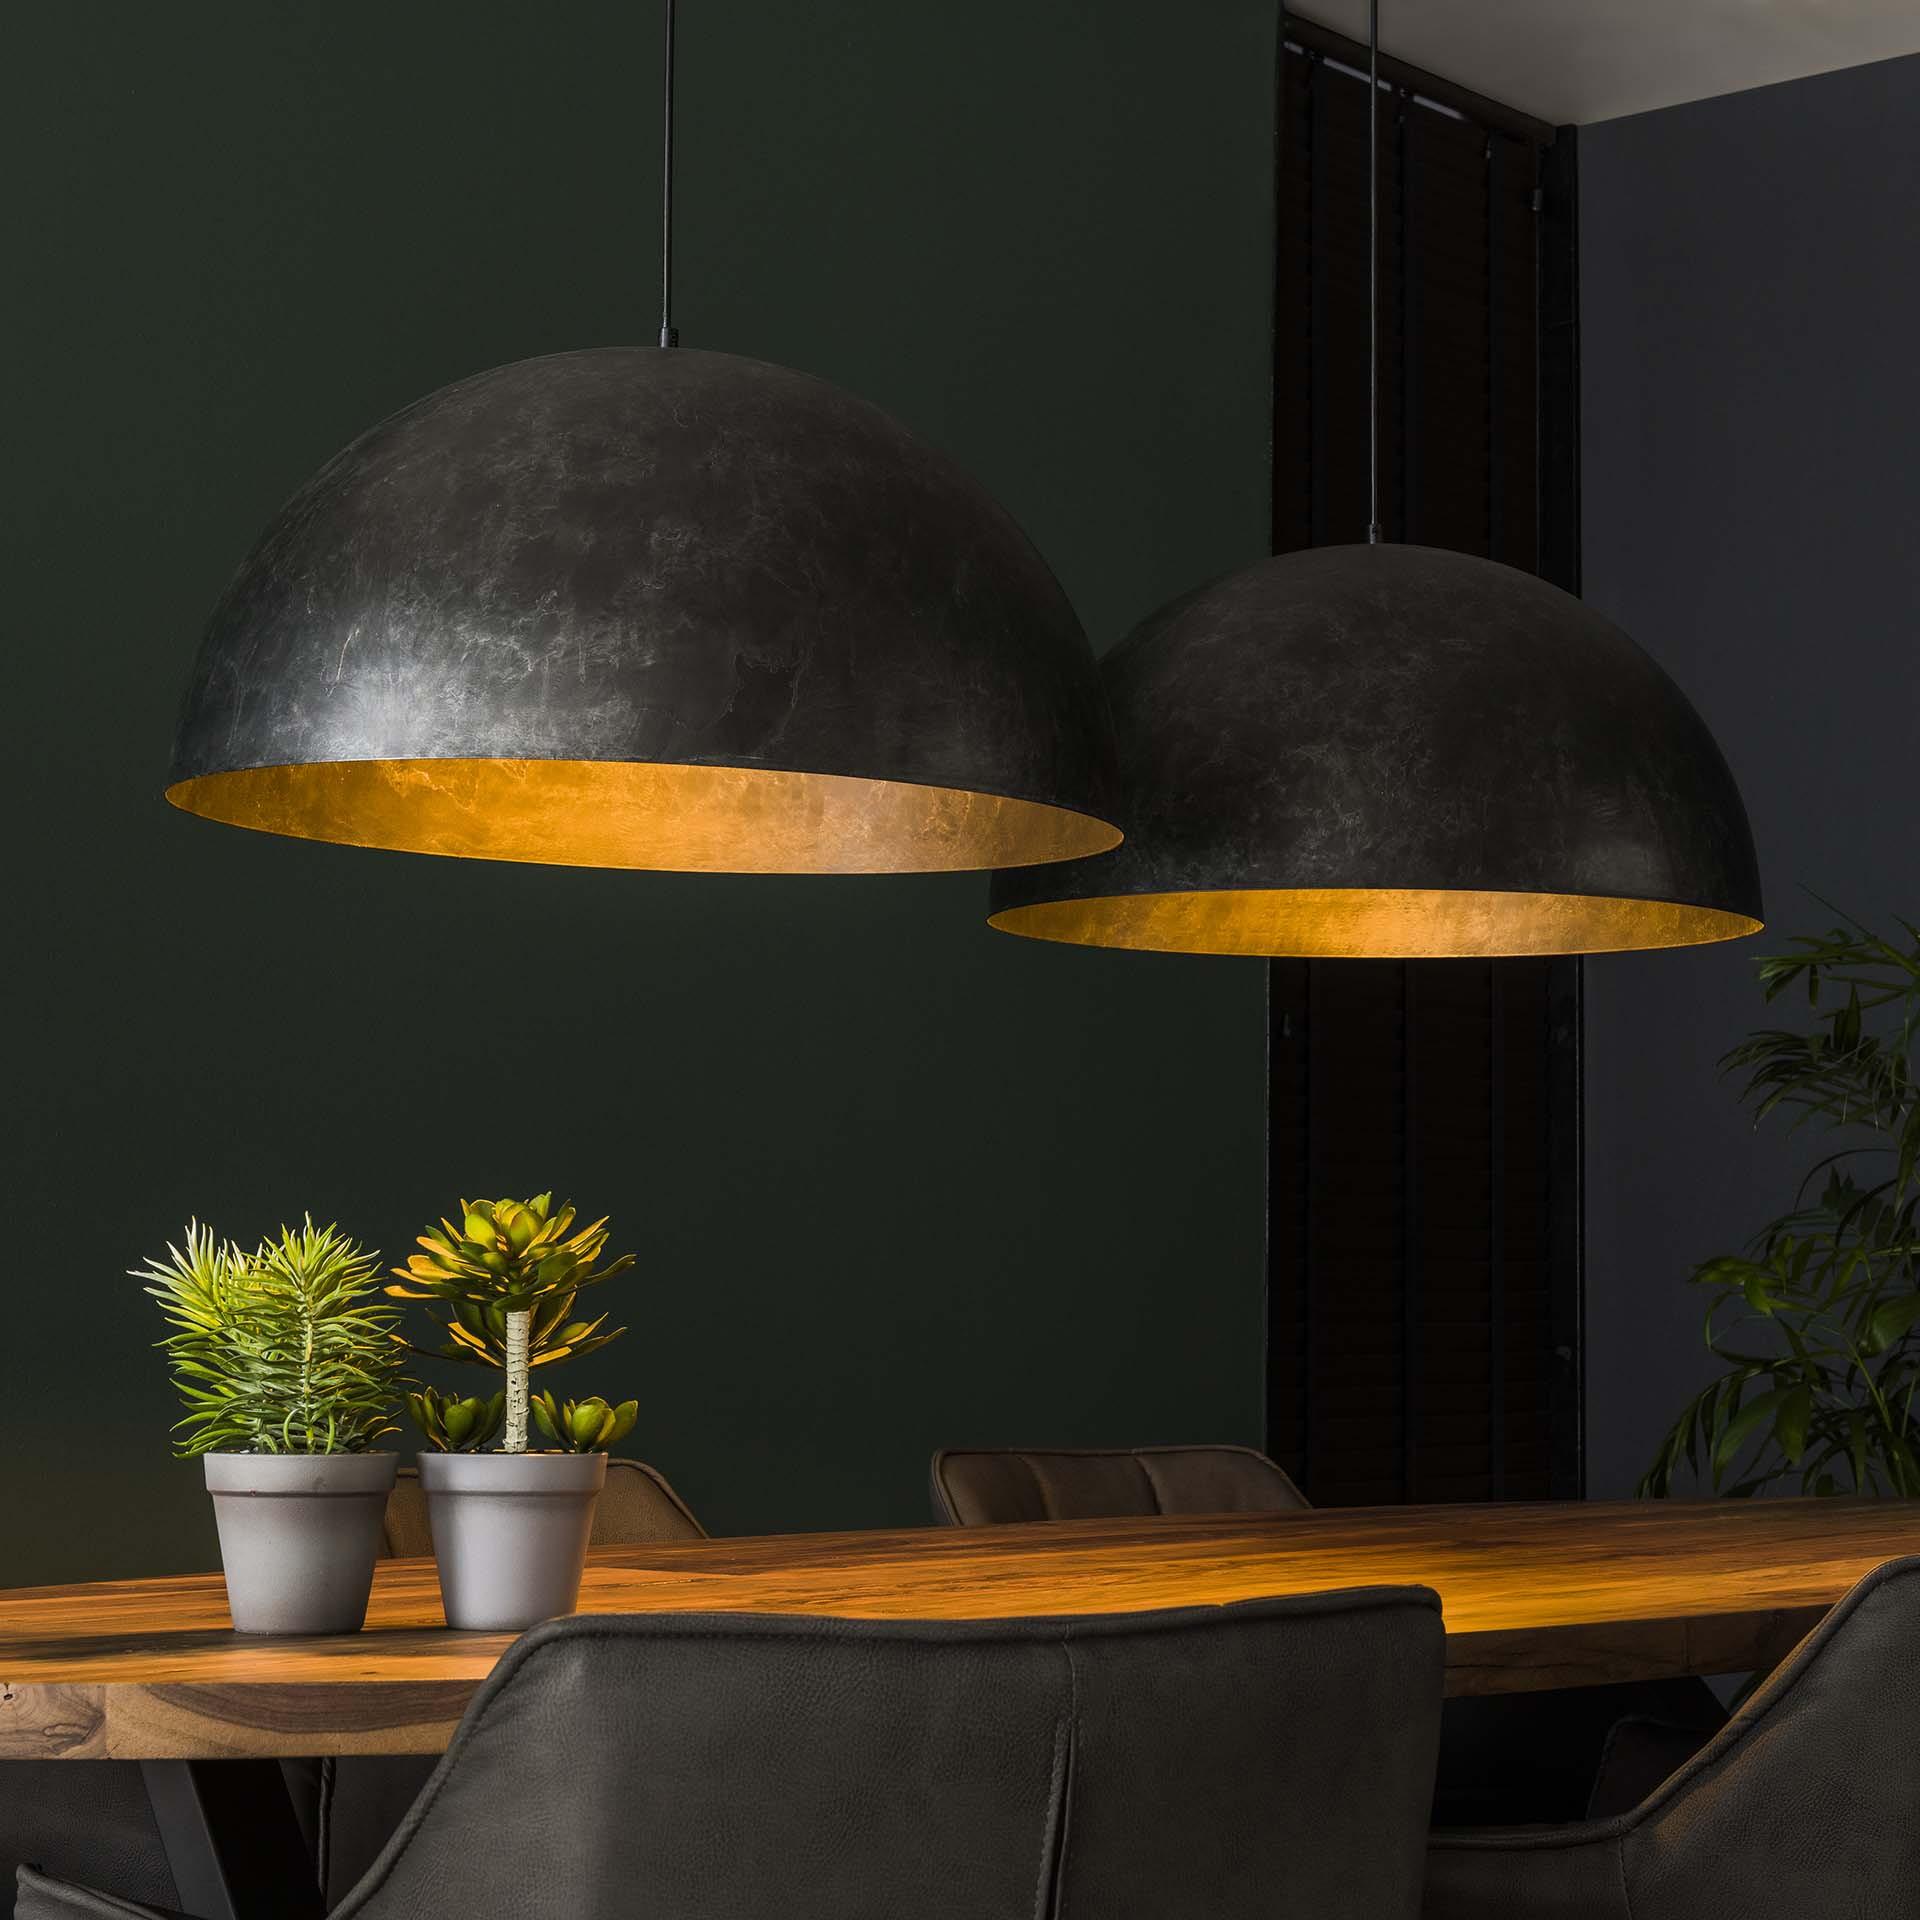 Hanglamp 'Dome' 2-lamps, Ø60cm, kleur Charcoal